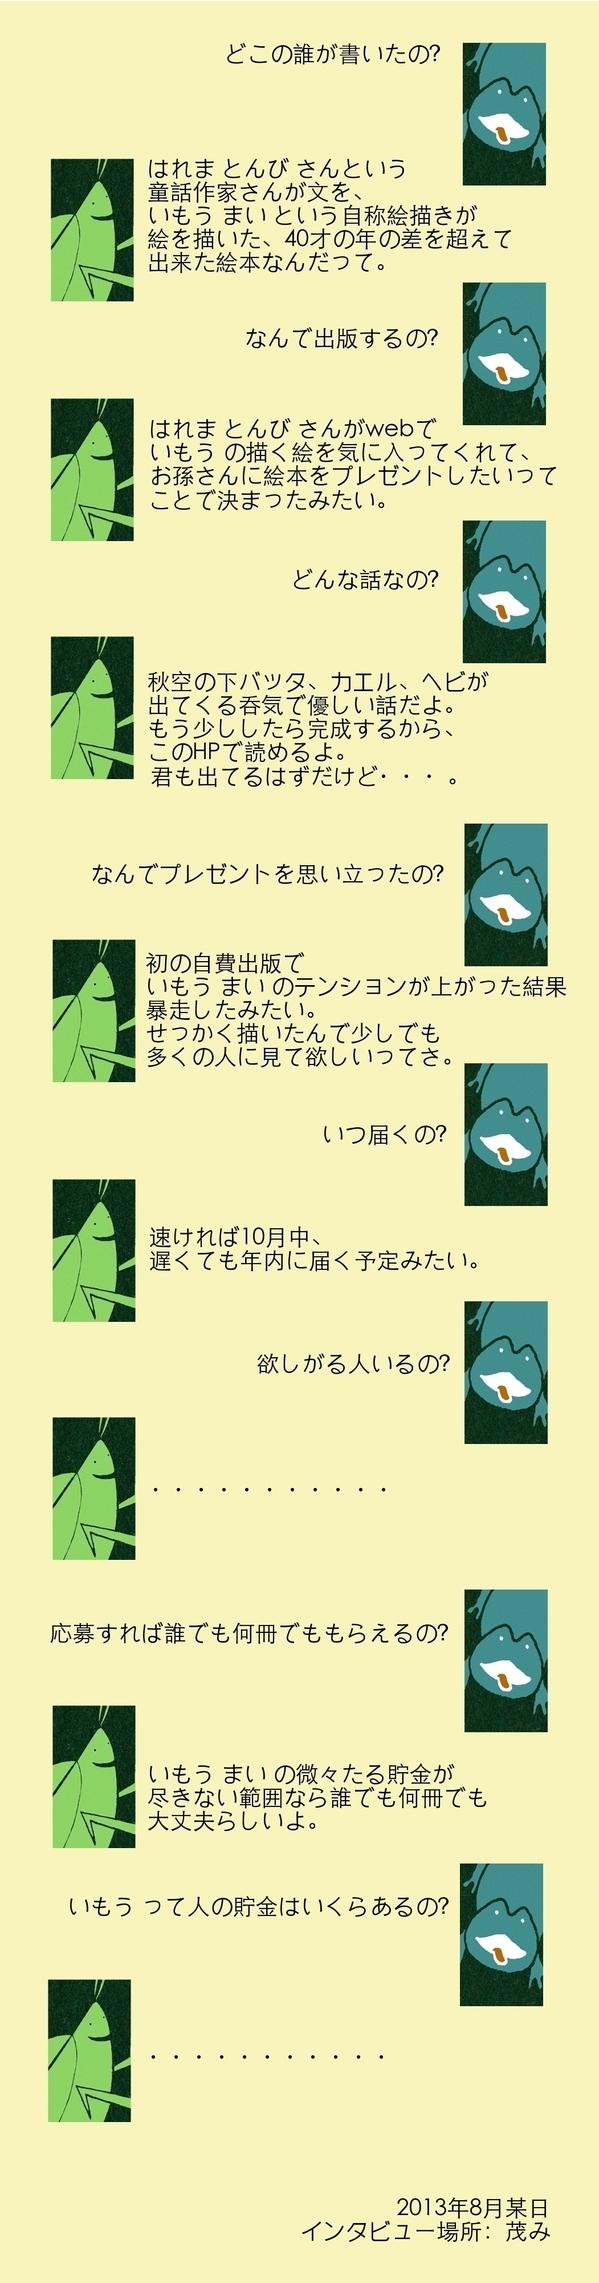 zen-card-2.jpg